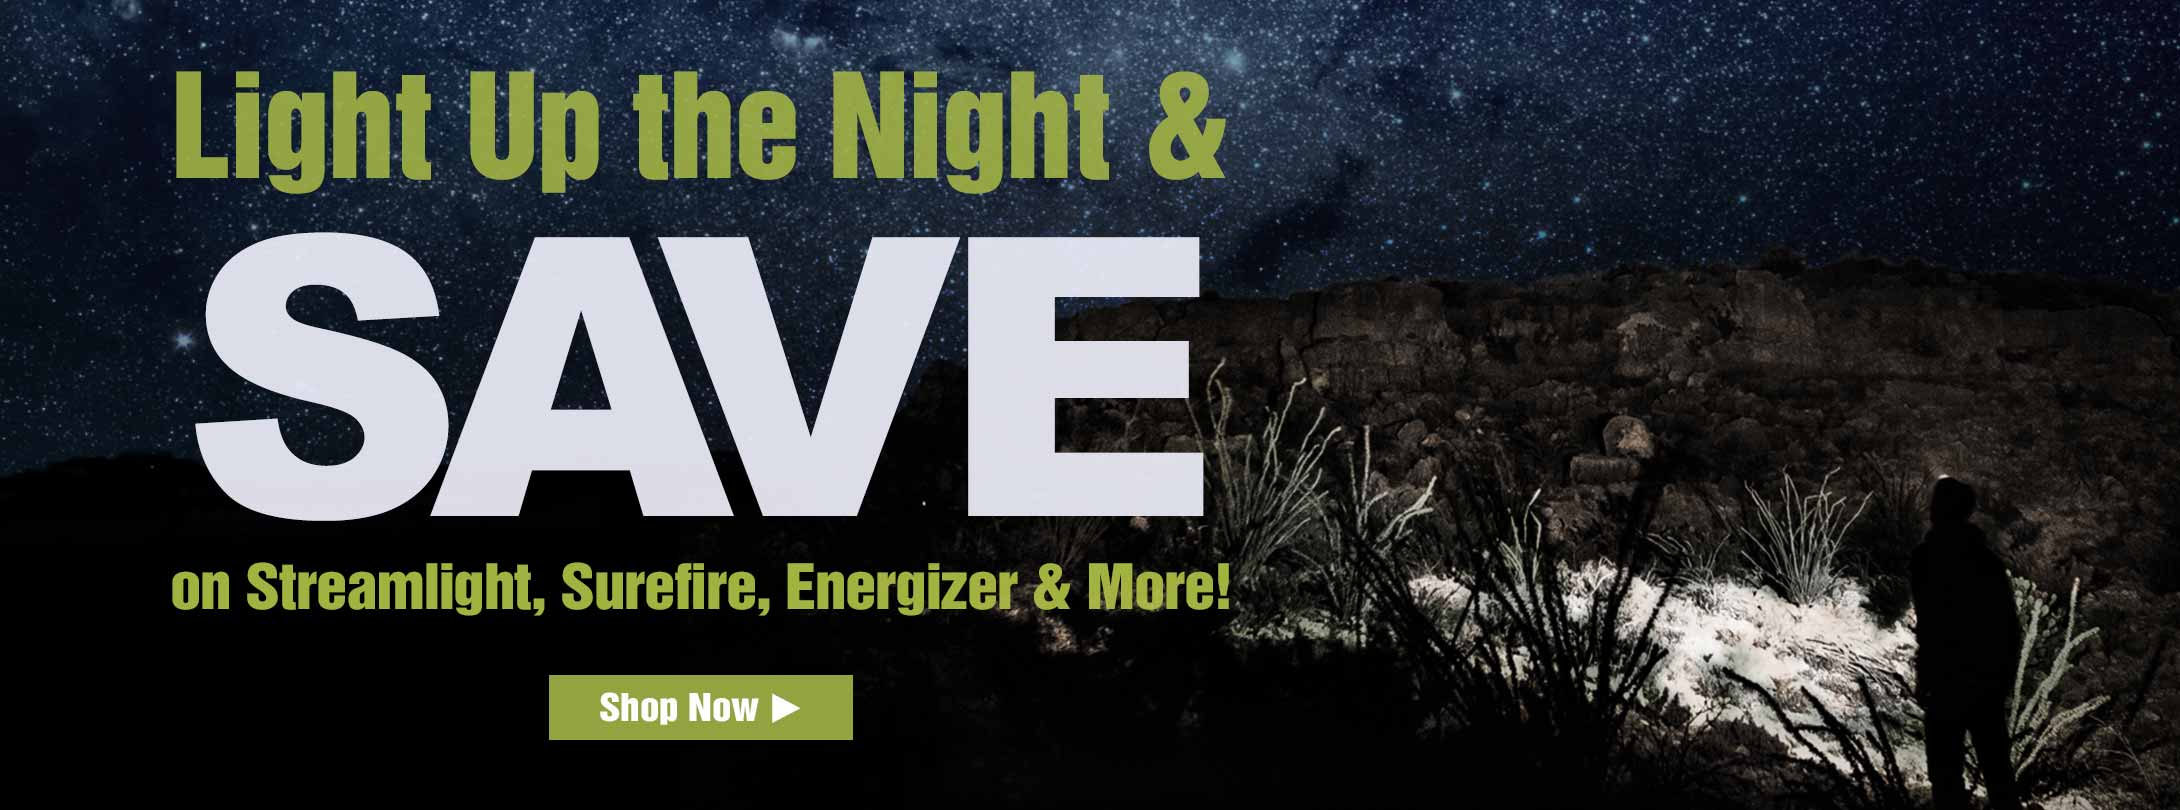 Light Up the Night & Save